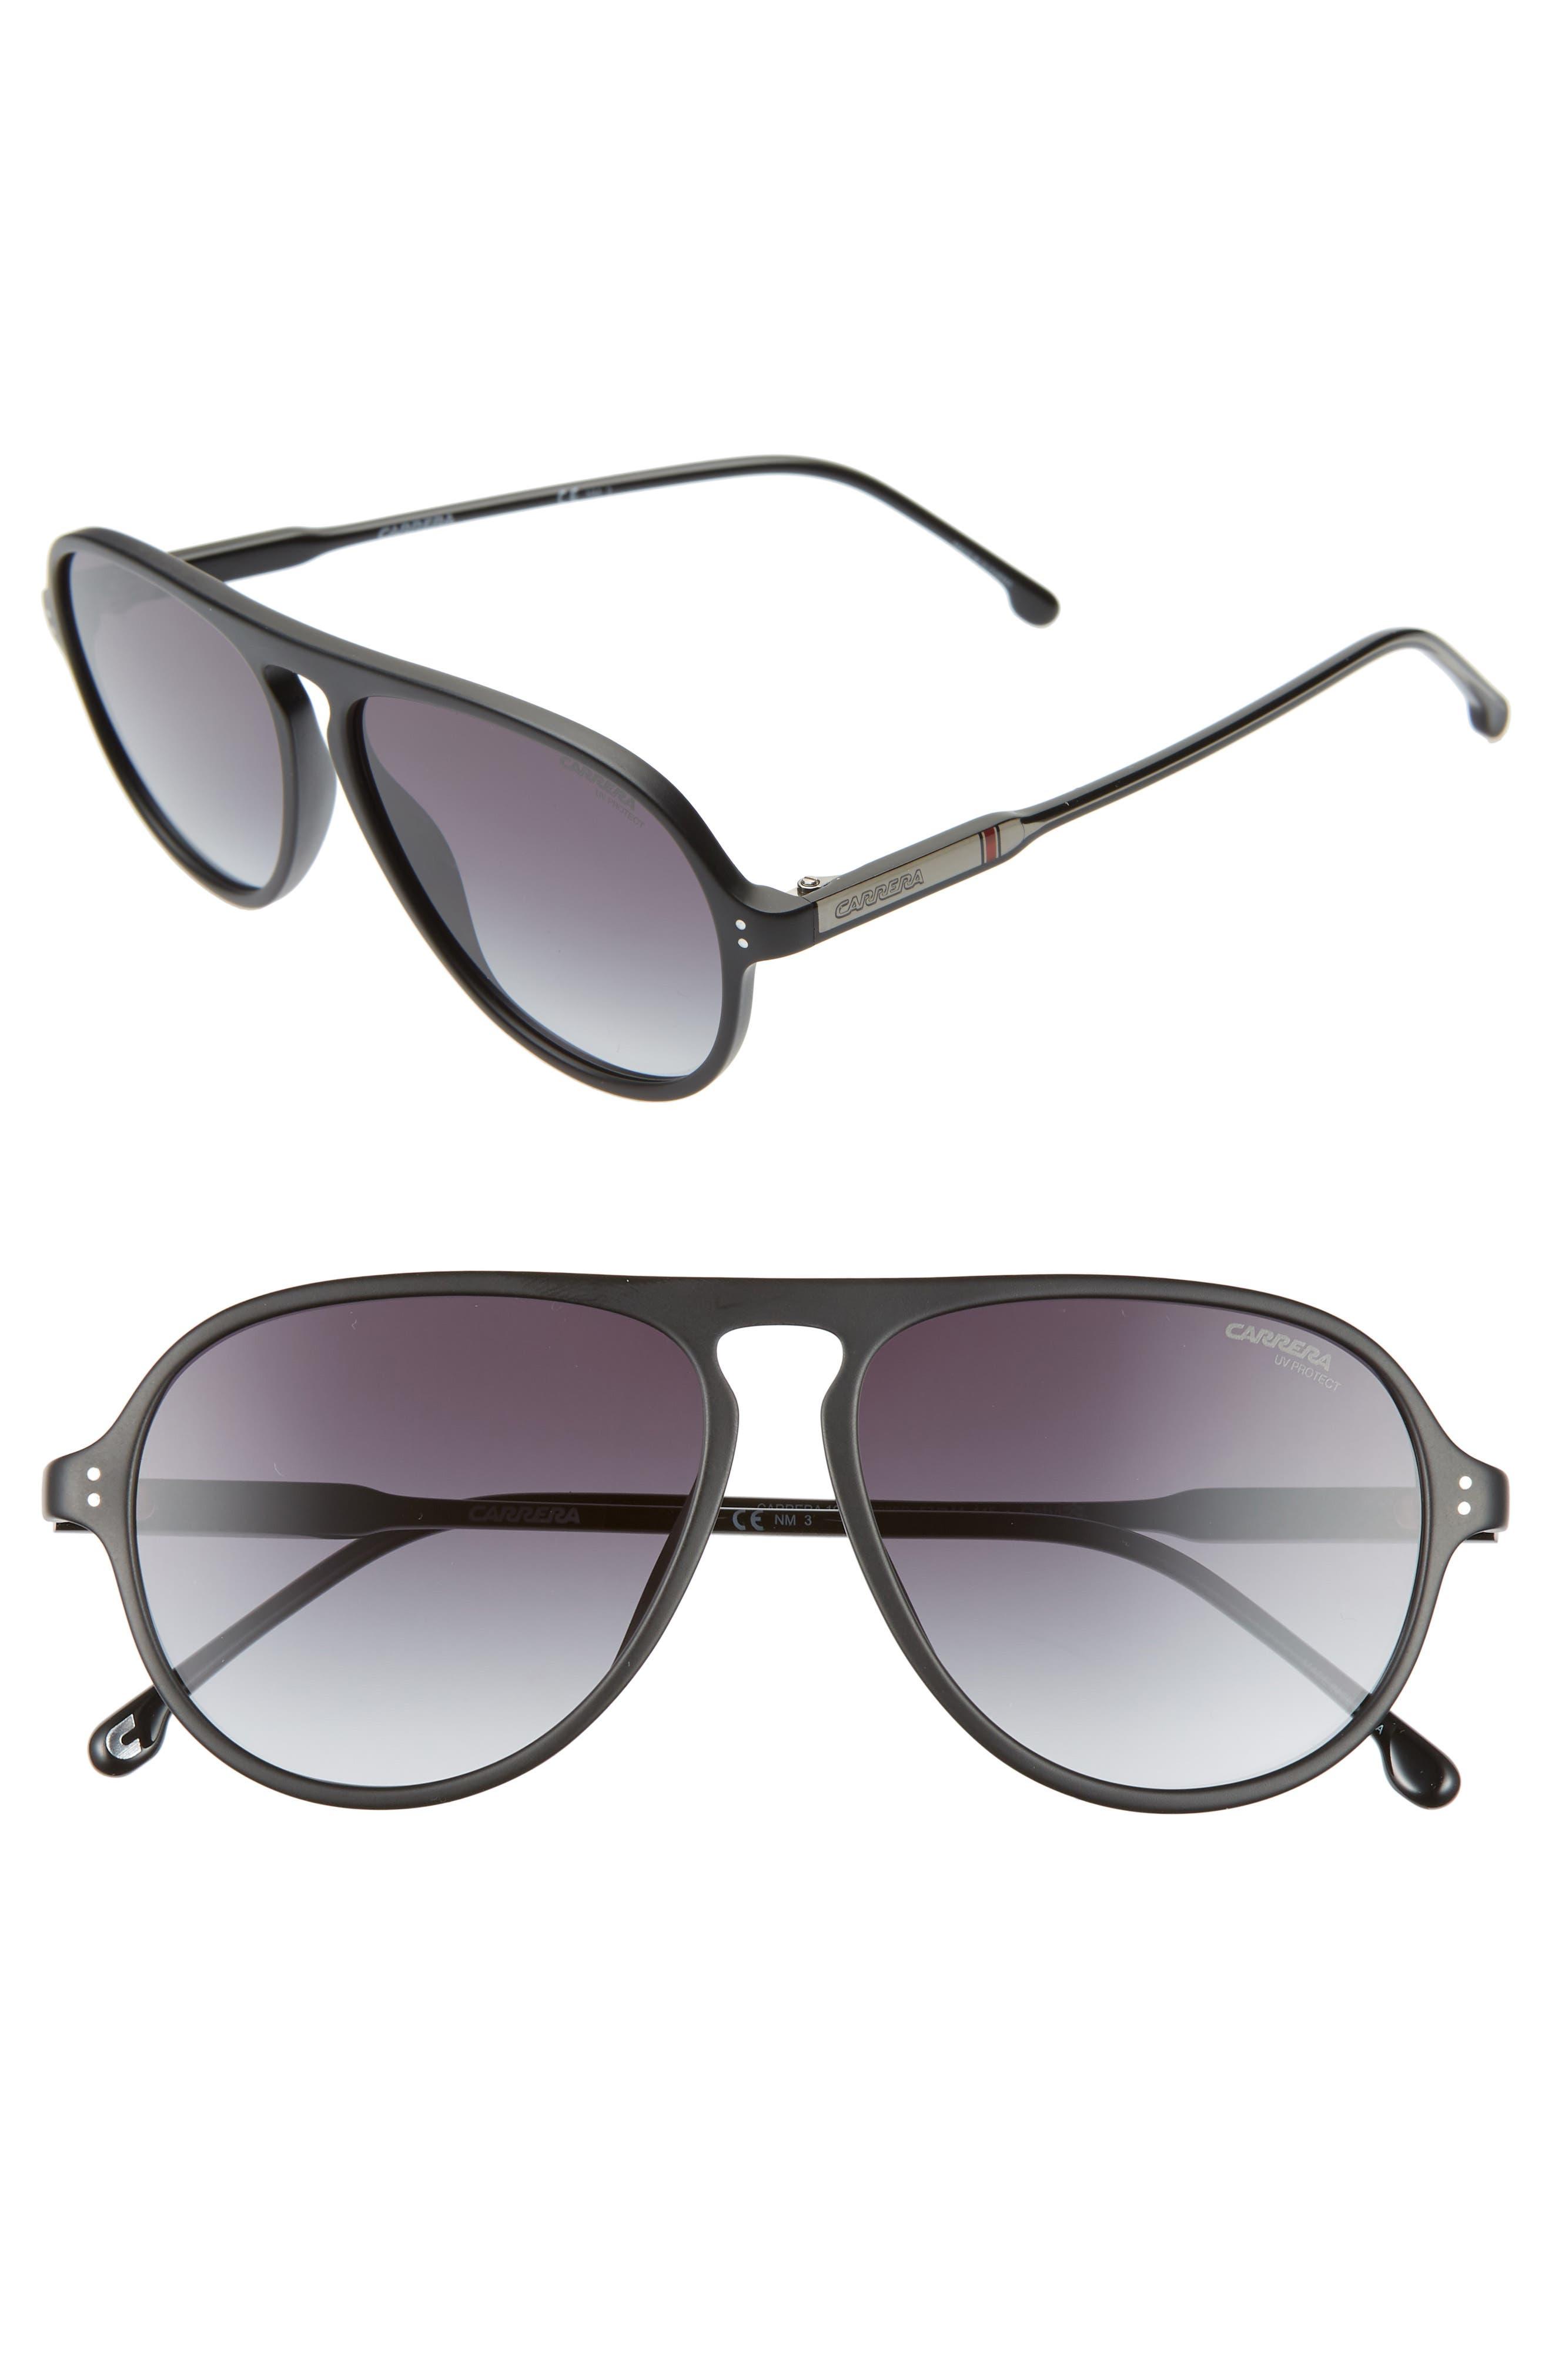 Carrera Eyewear 57Mm Aviator Sunglasses - Matte Black